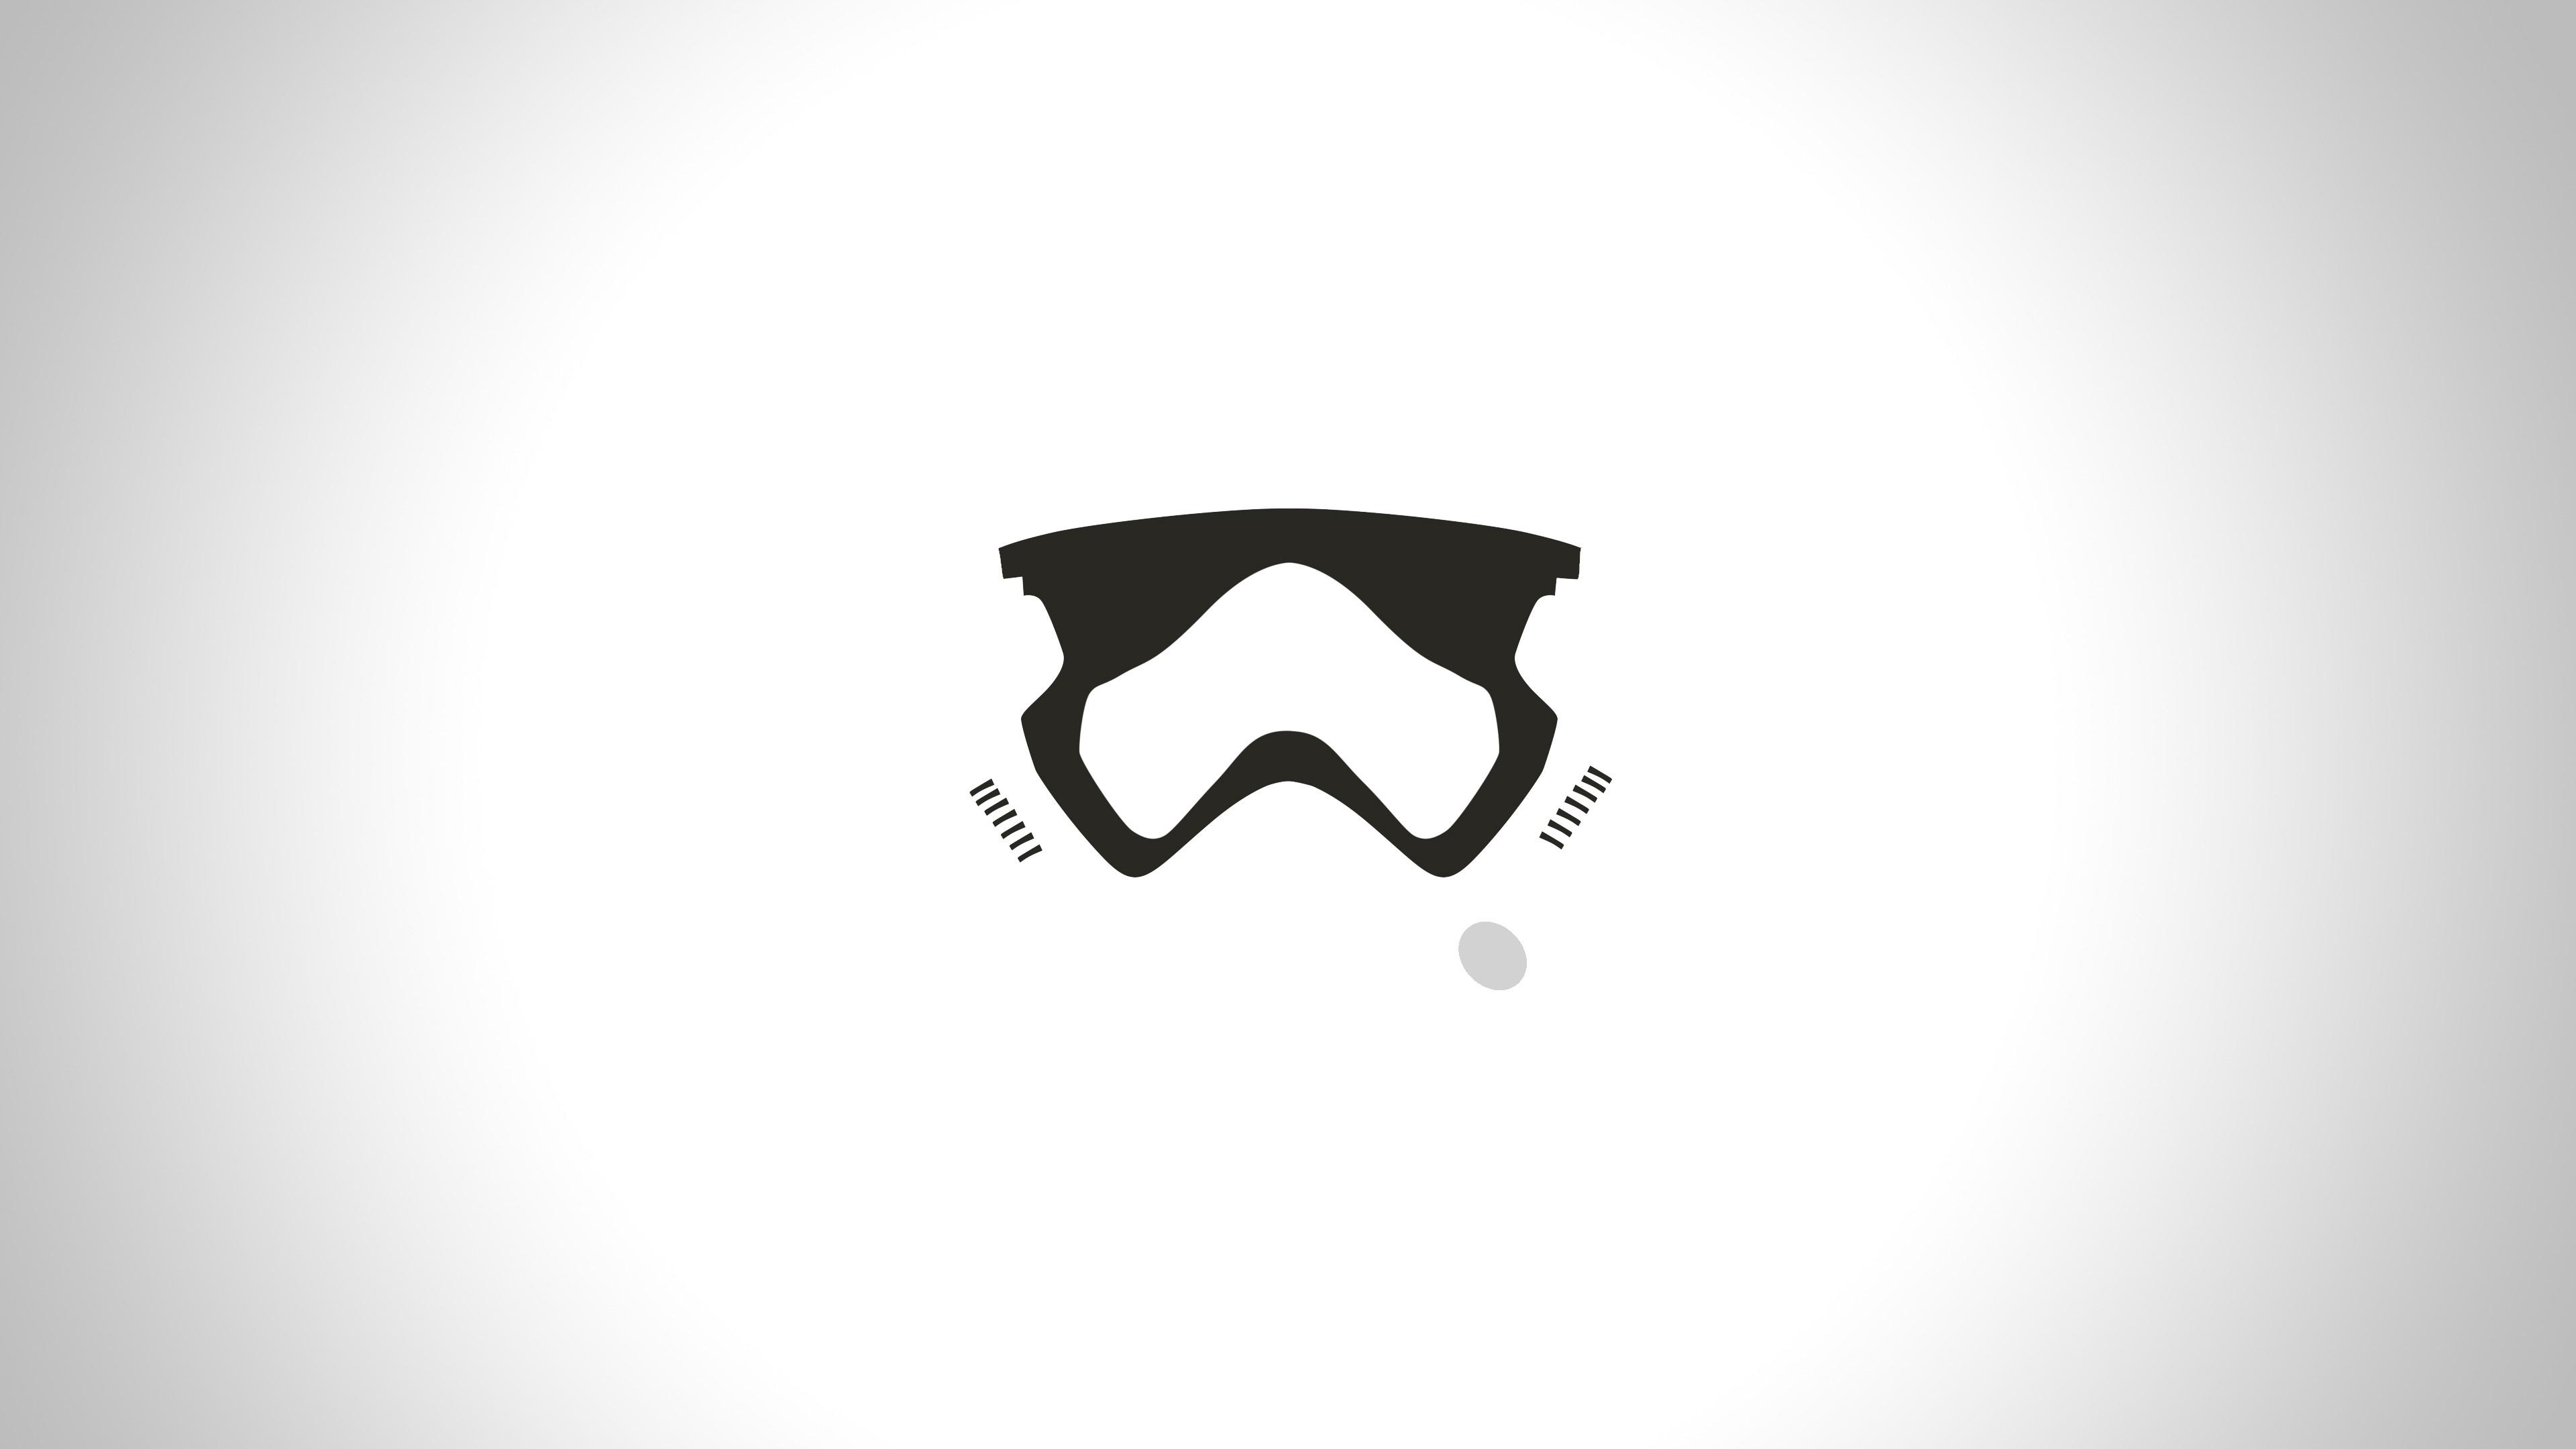 Stormtrooper Wallpaper 69 Images